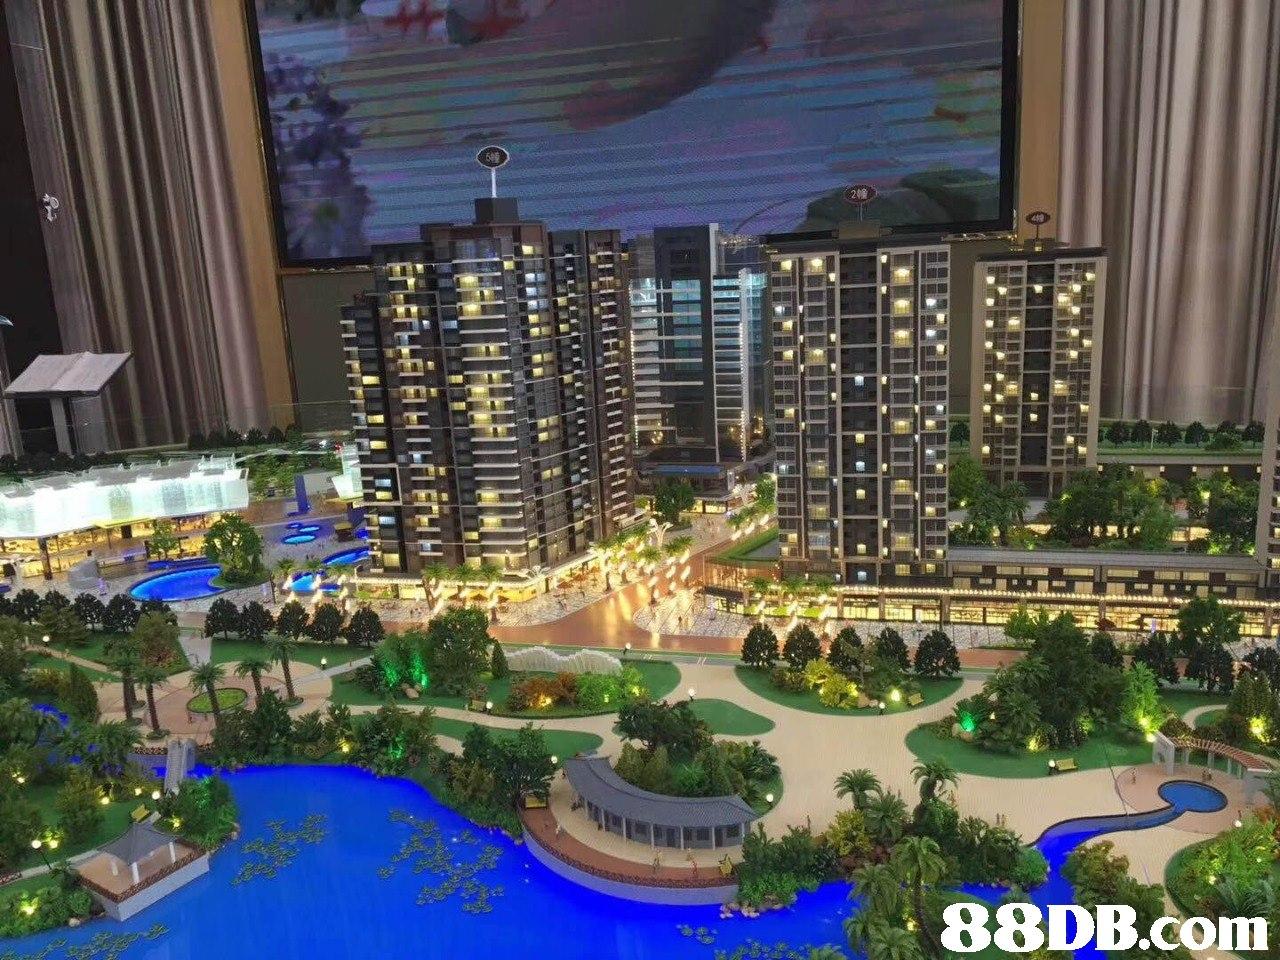 metropolitan area,condominium,city,metropolis,mixed use